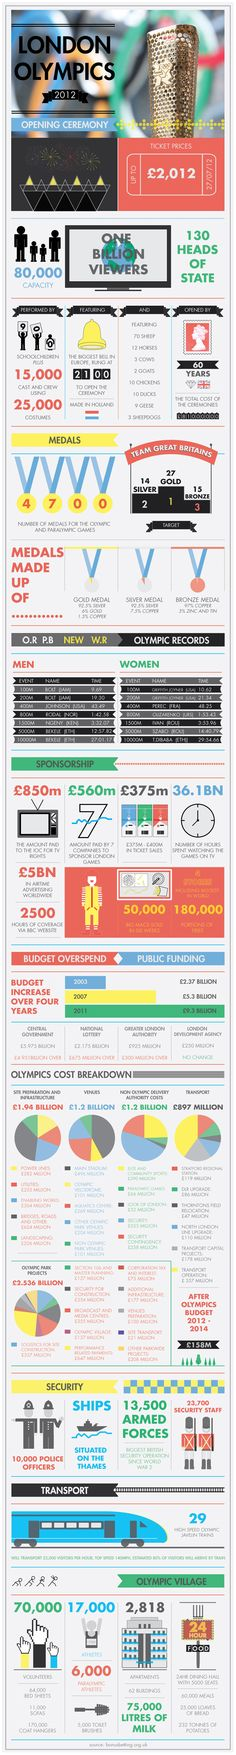 London Opening Ceremony Infographic